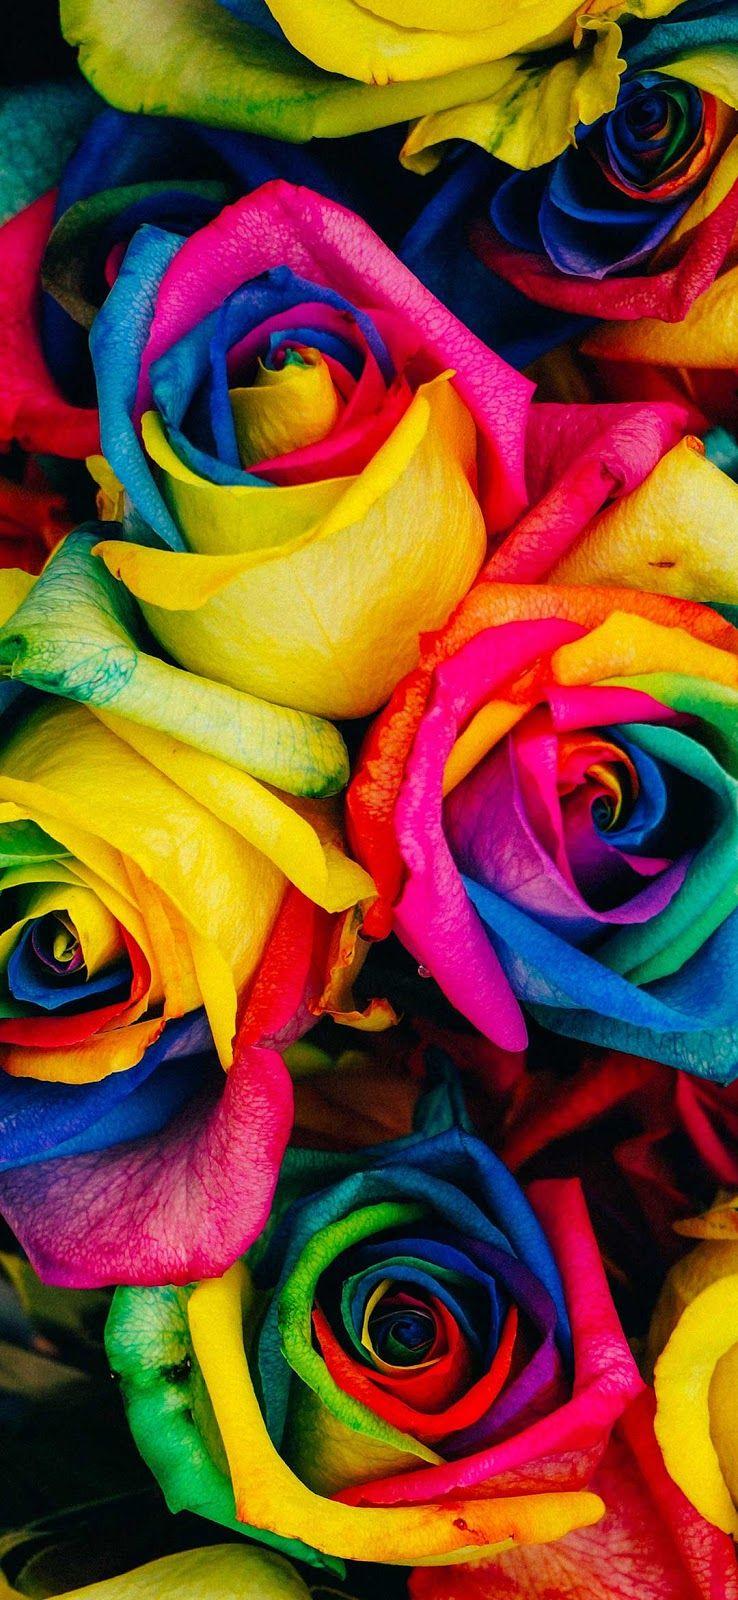 Pin By خلفيات On صور خلفيات موبايل ايفون روعه Rainbow Roses Colorful Roses Flower Photos